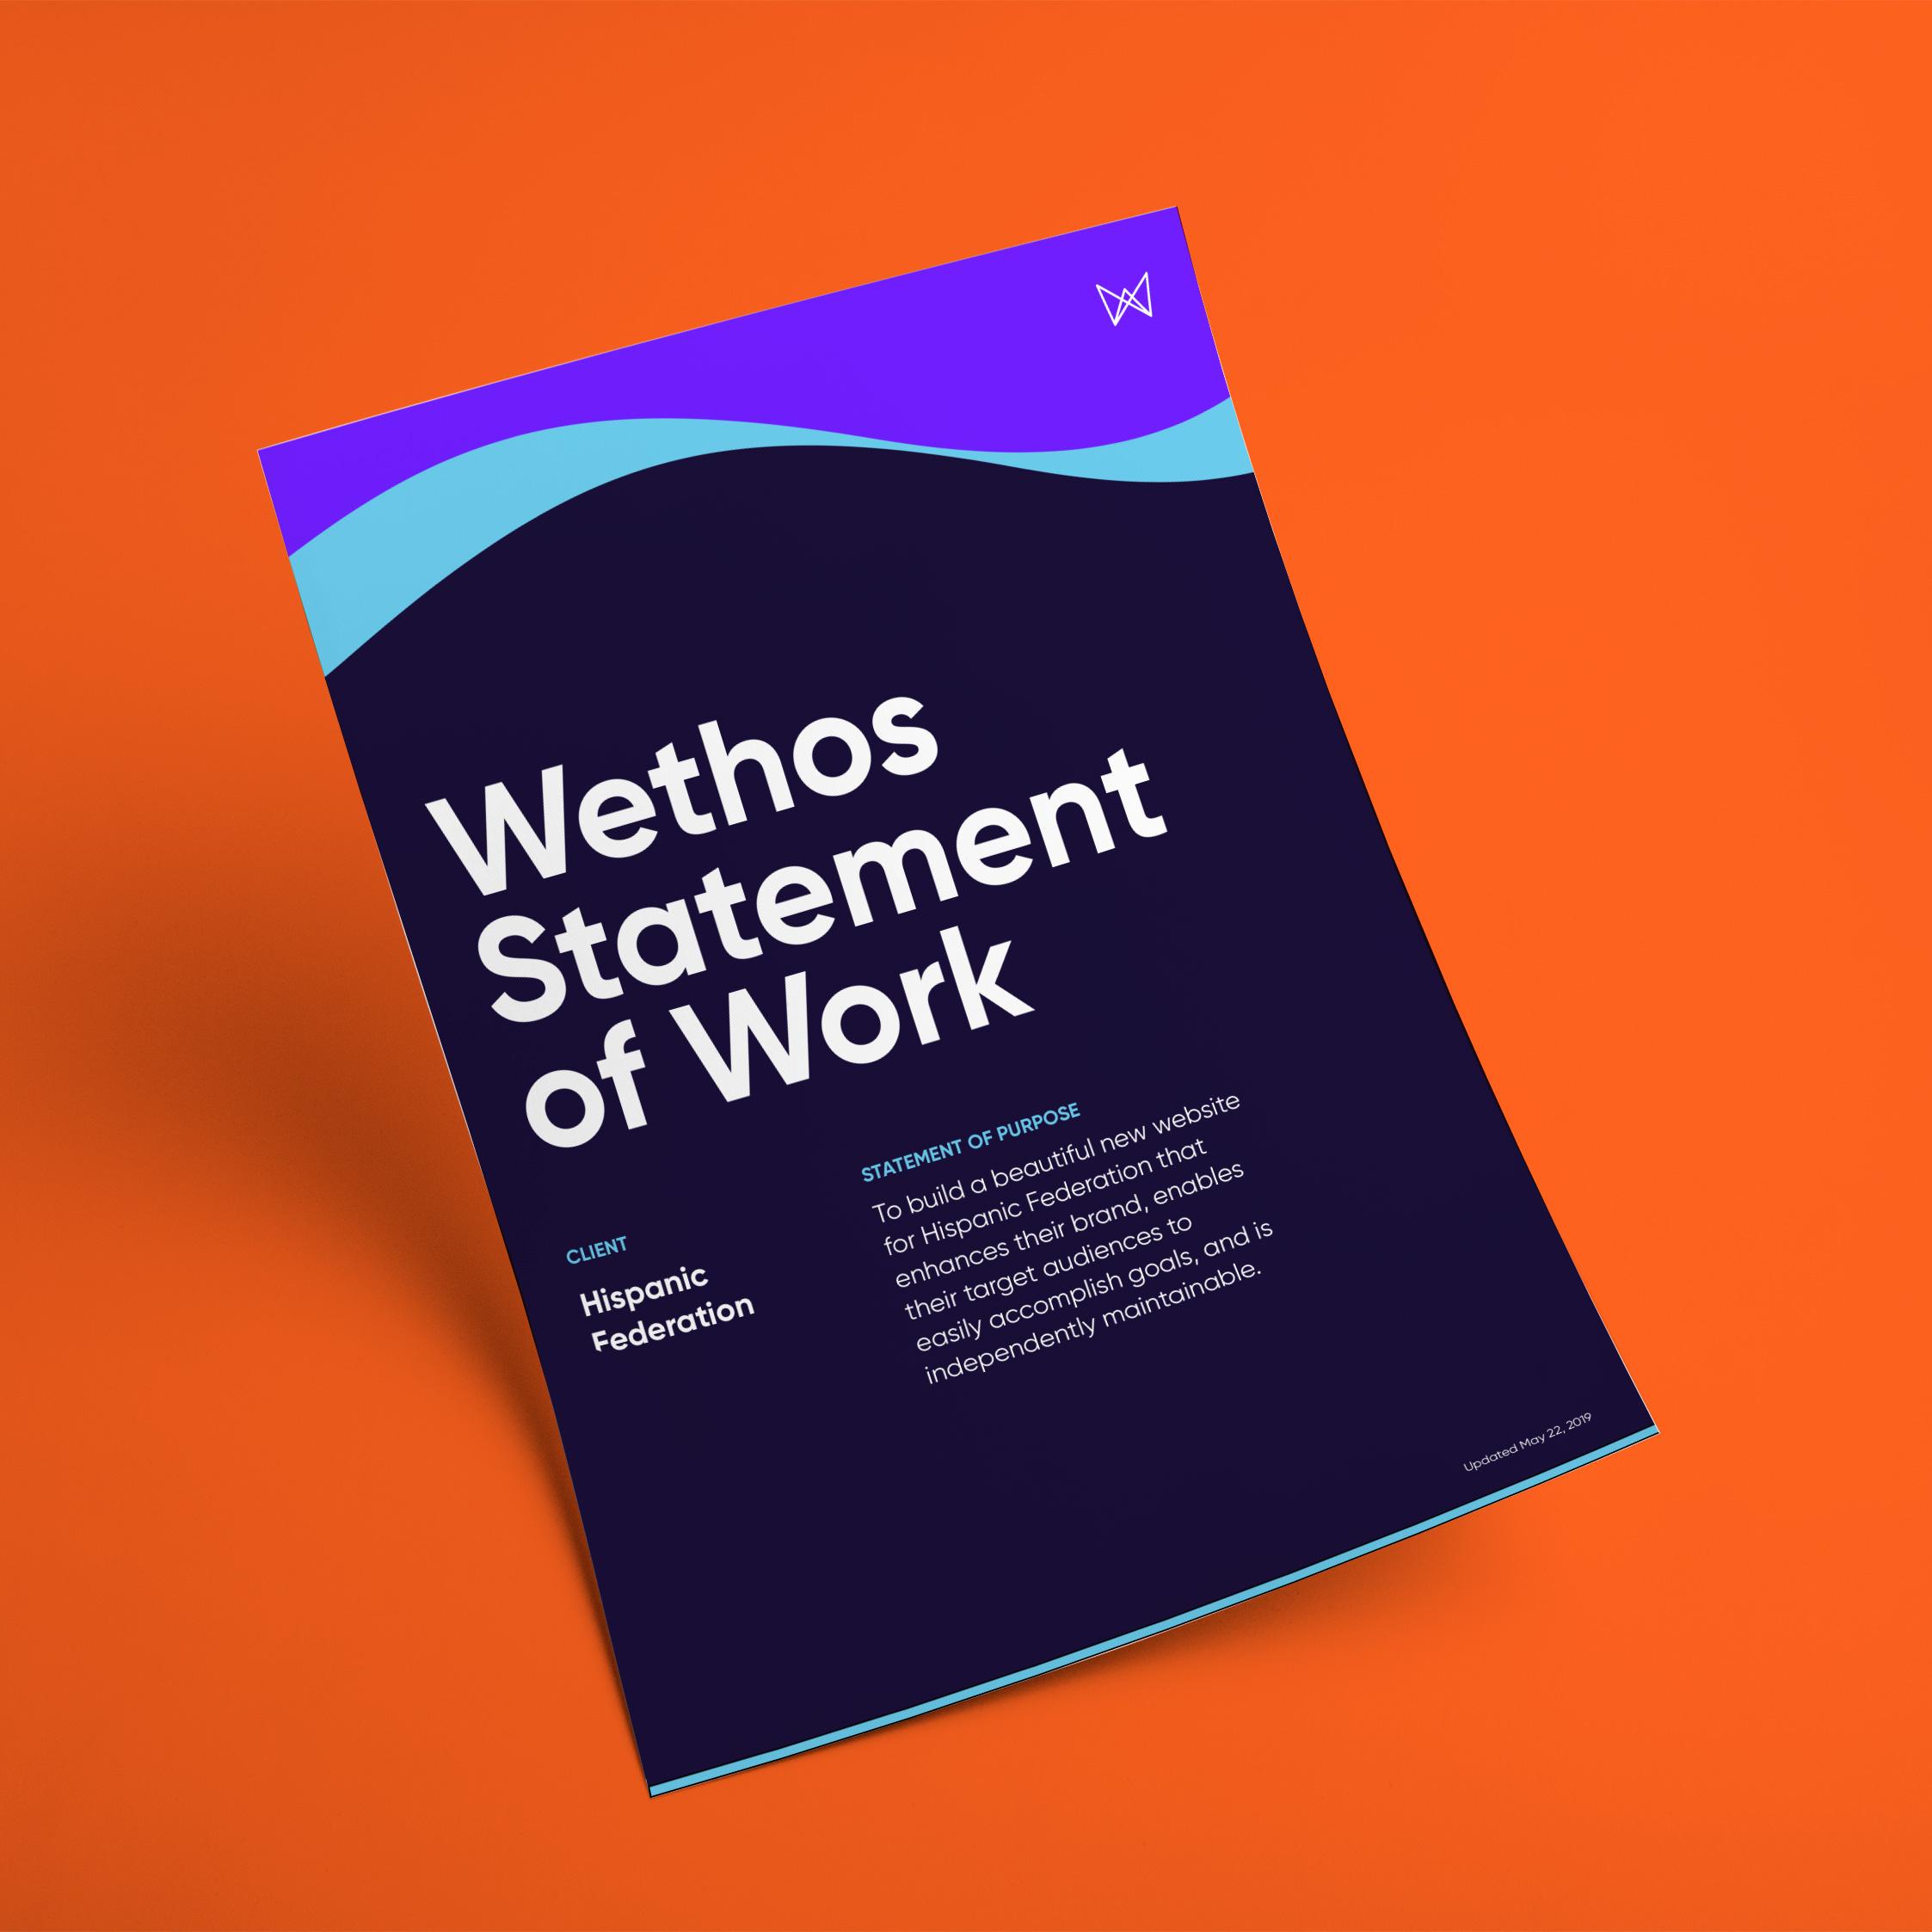 WethosStatementofWork.jpg